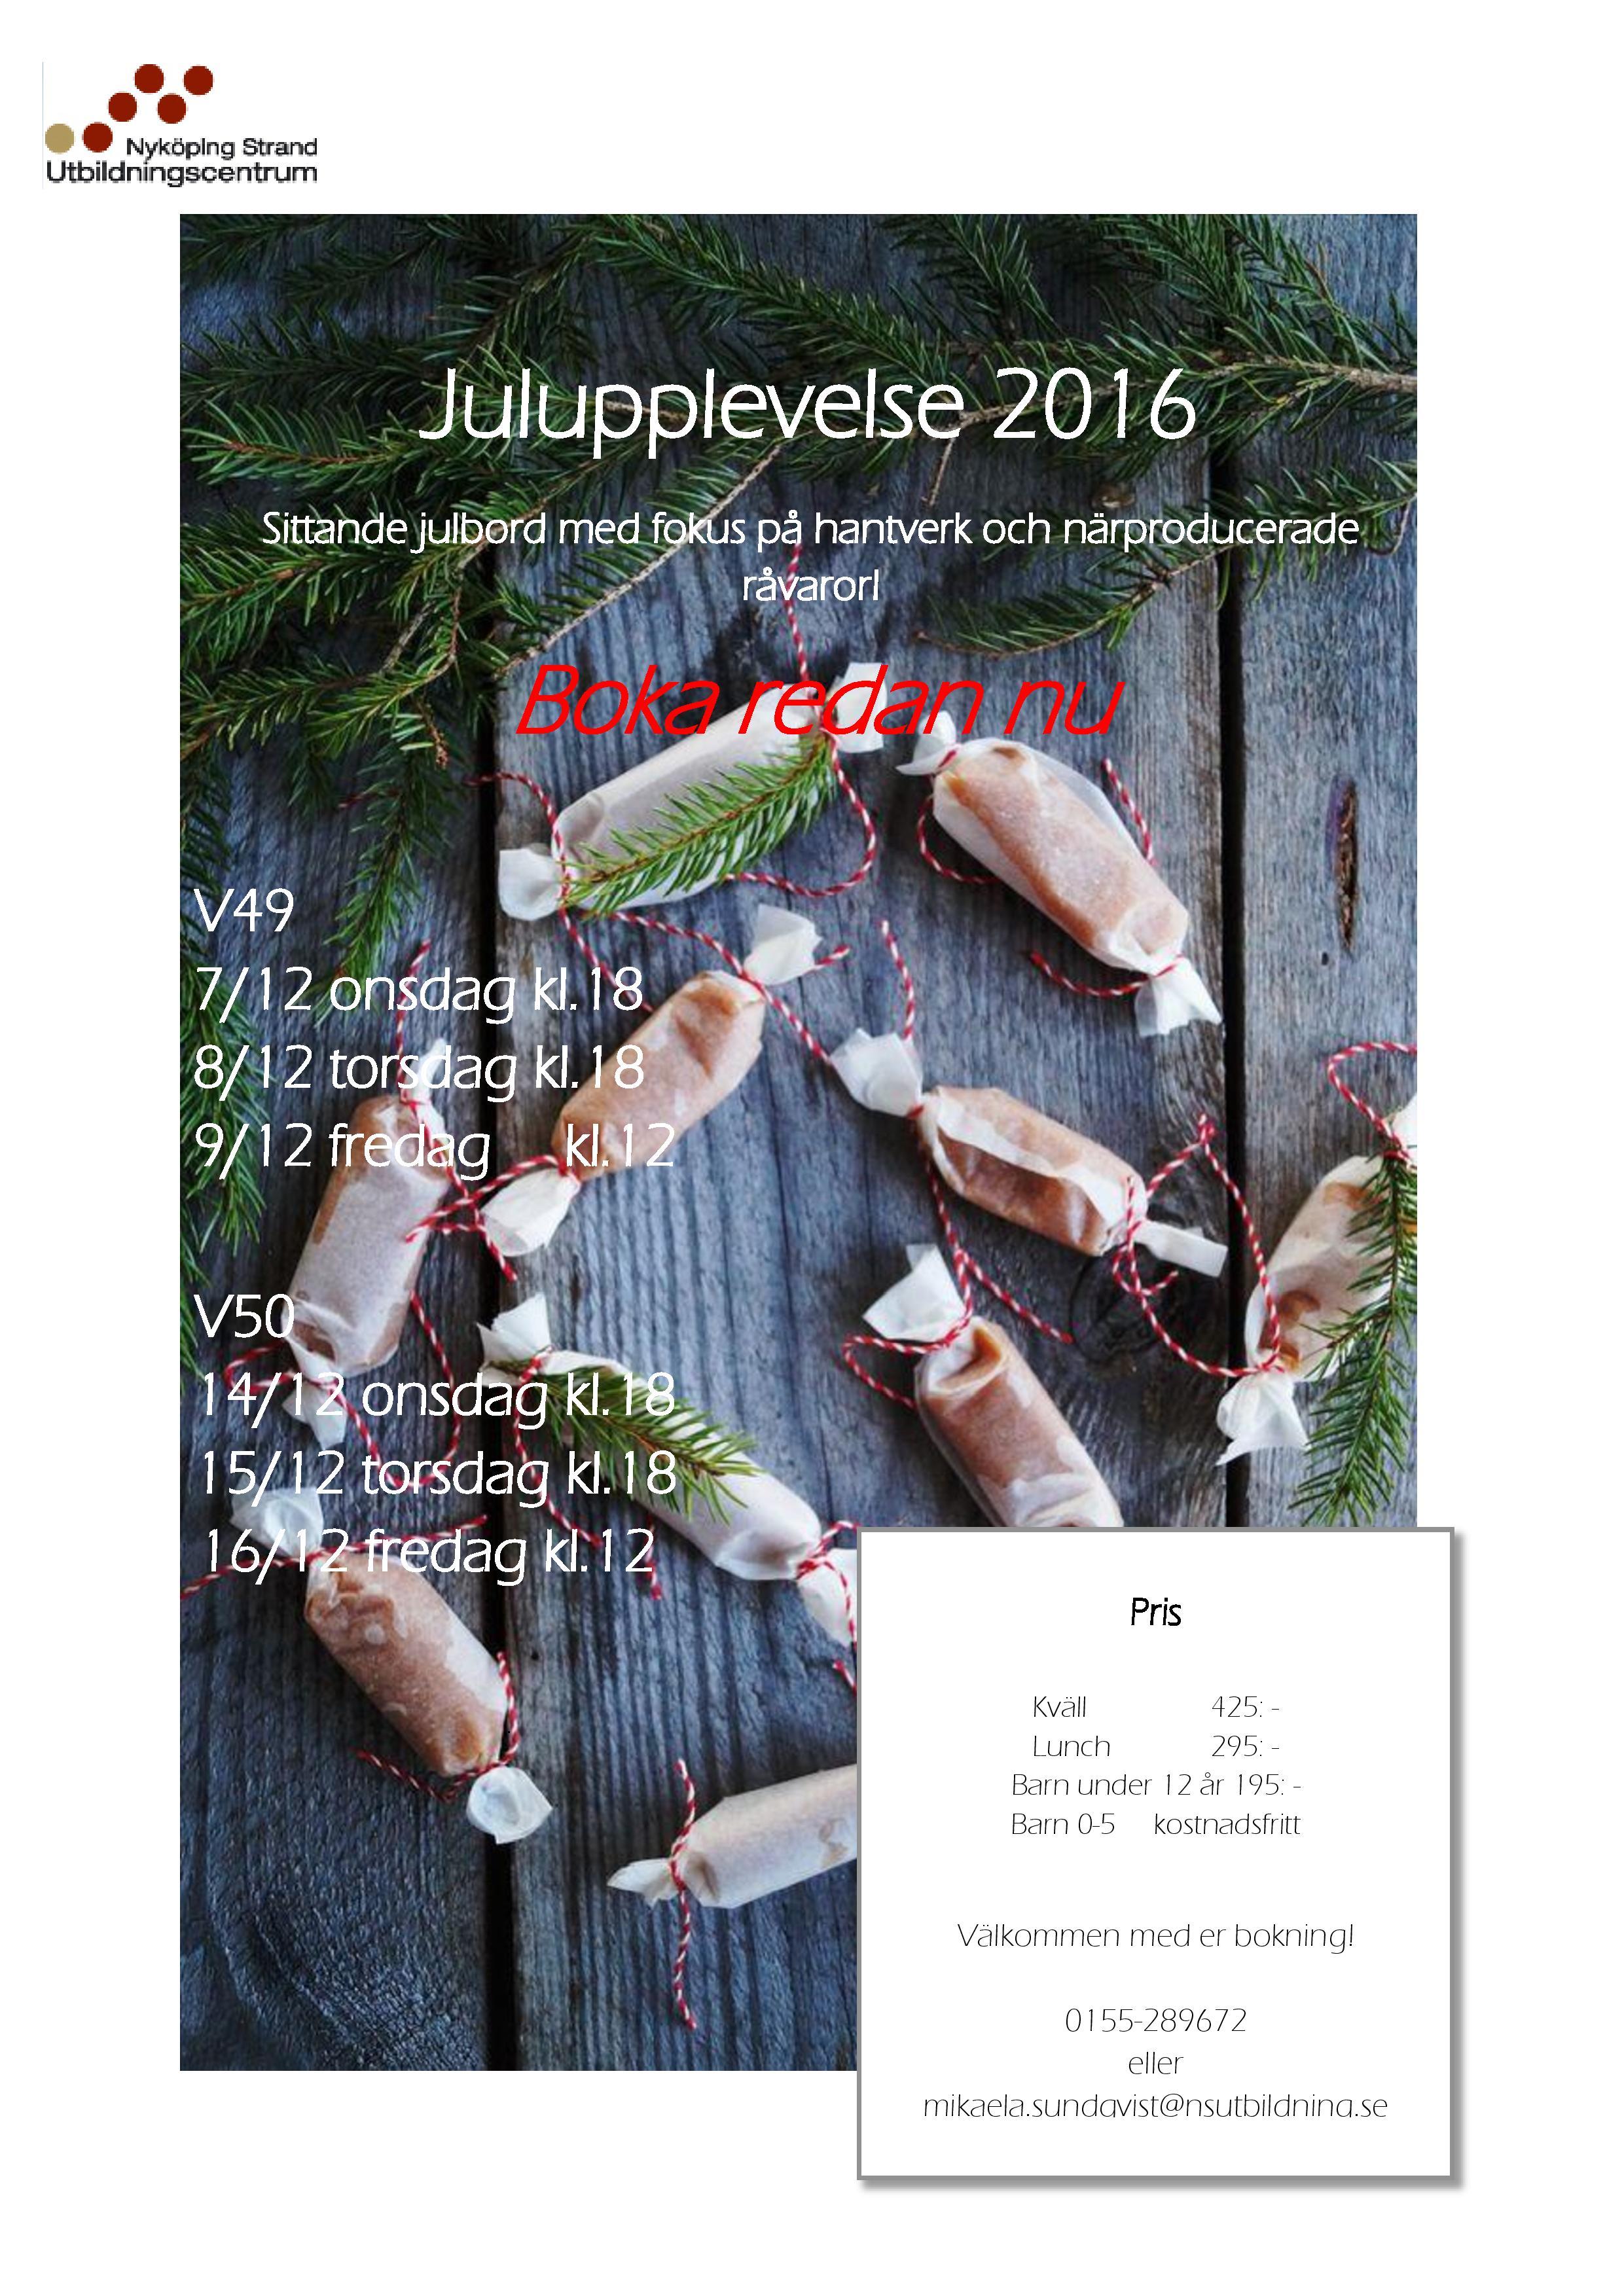 Dags att boka julupplevelse 2016